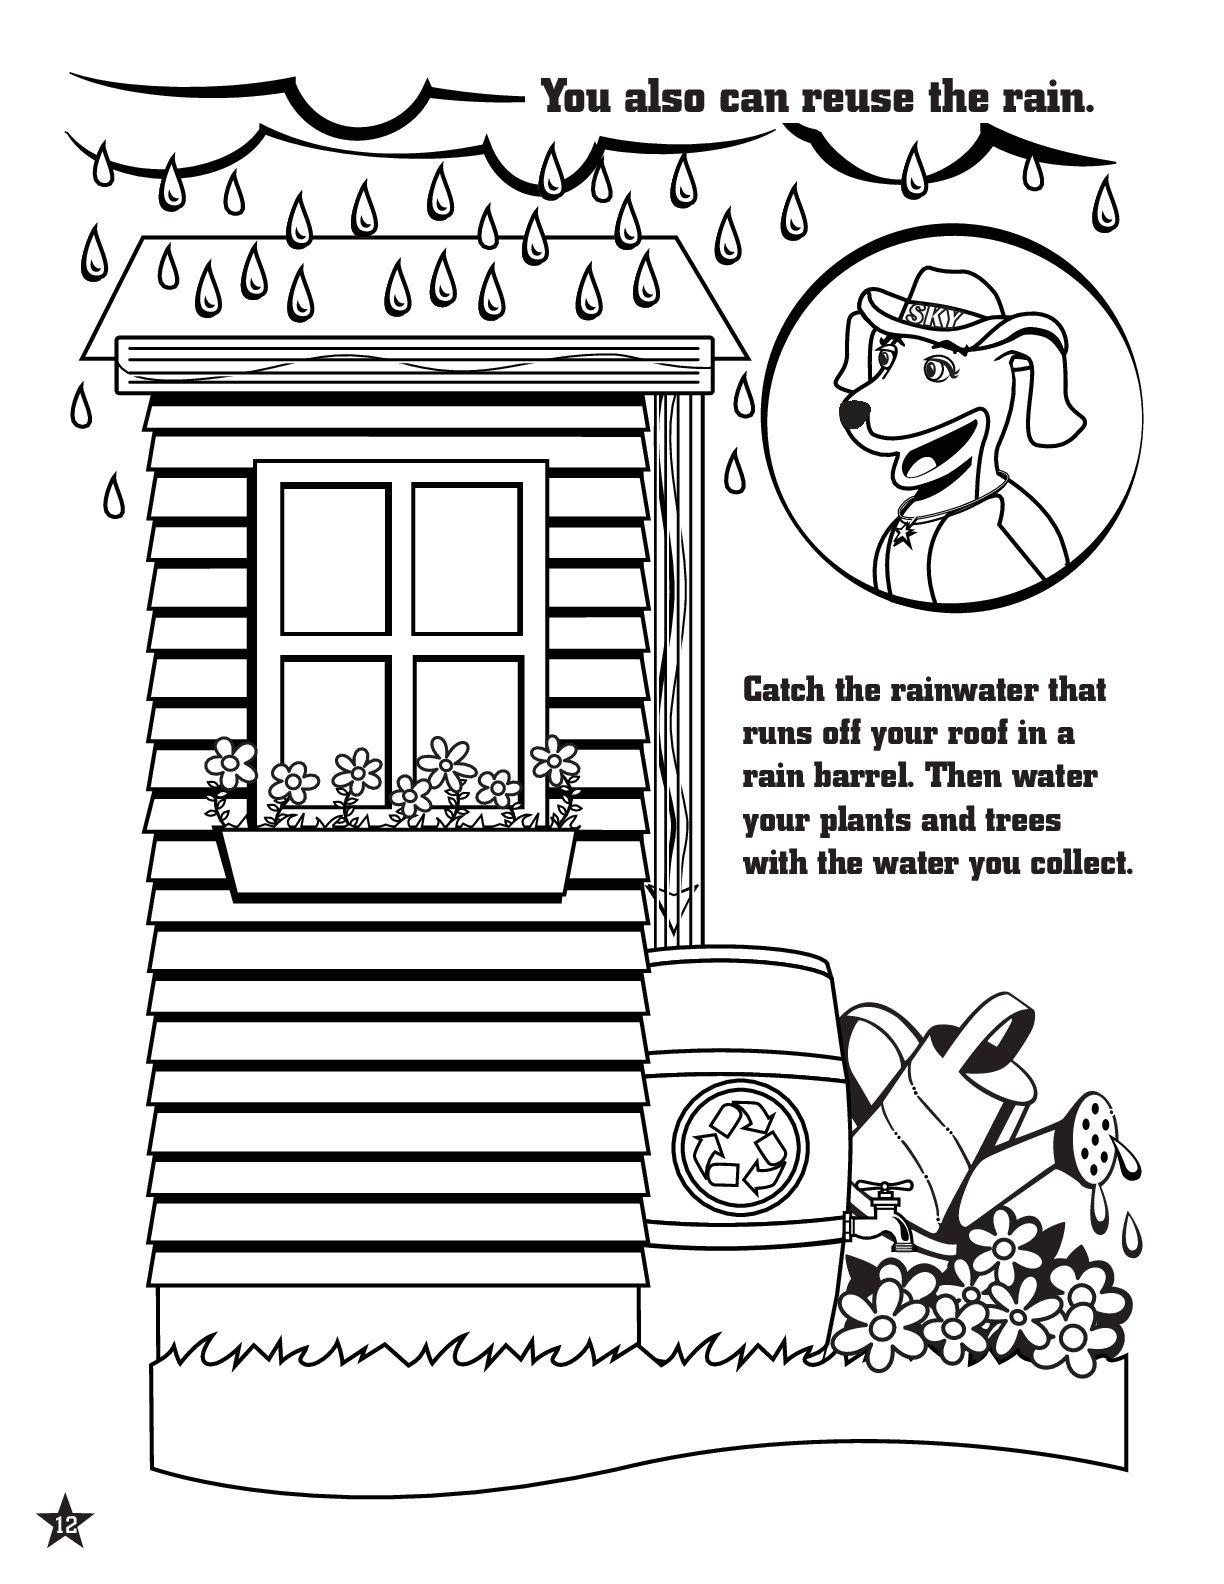 Rainwater Harvesting Coloring Page Rainwaterharvesting